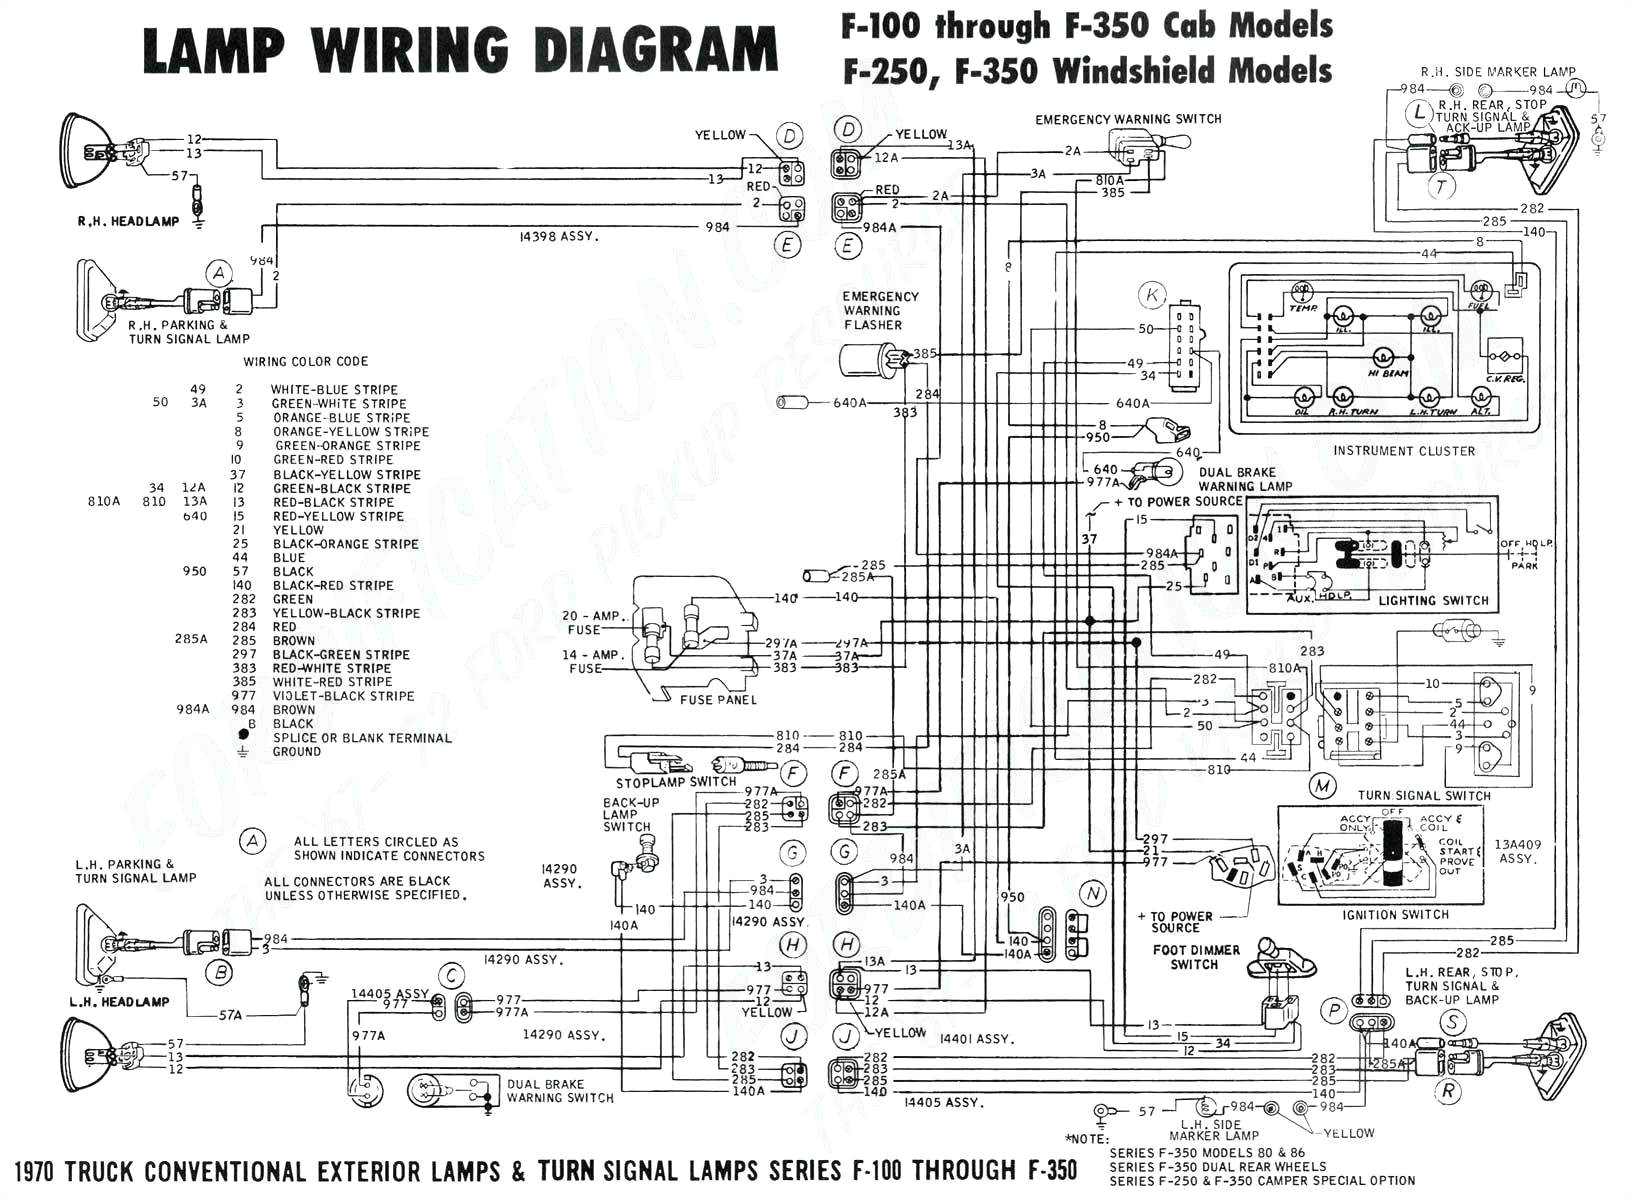 Kawasaki Ninja 250r Wiring Diagram 123 2002 Zx6 Fuse Box Wiring Resources